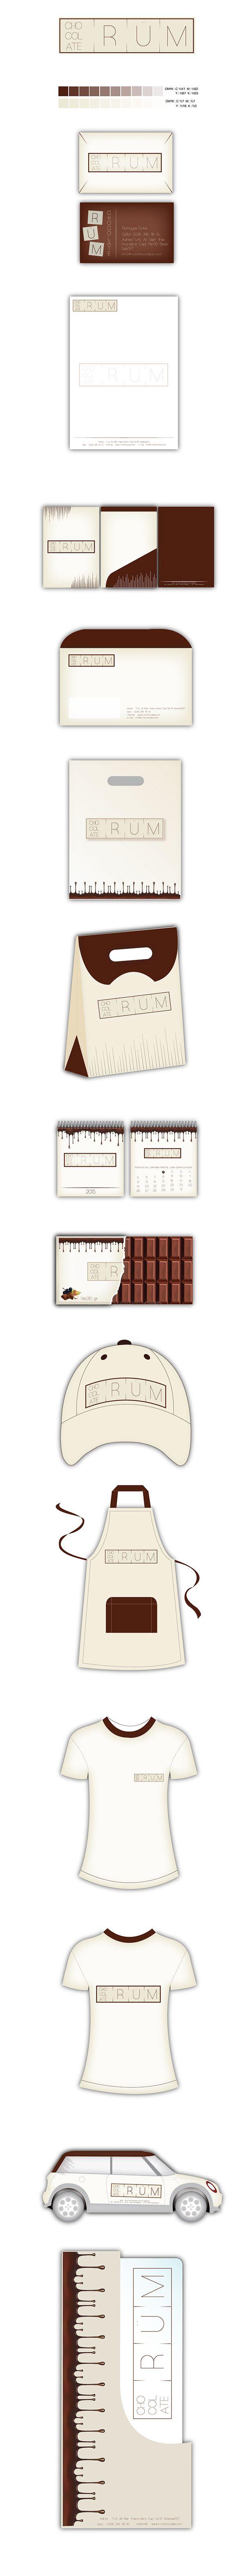 Rüm Chocolate on Behance